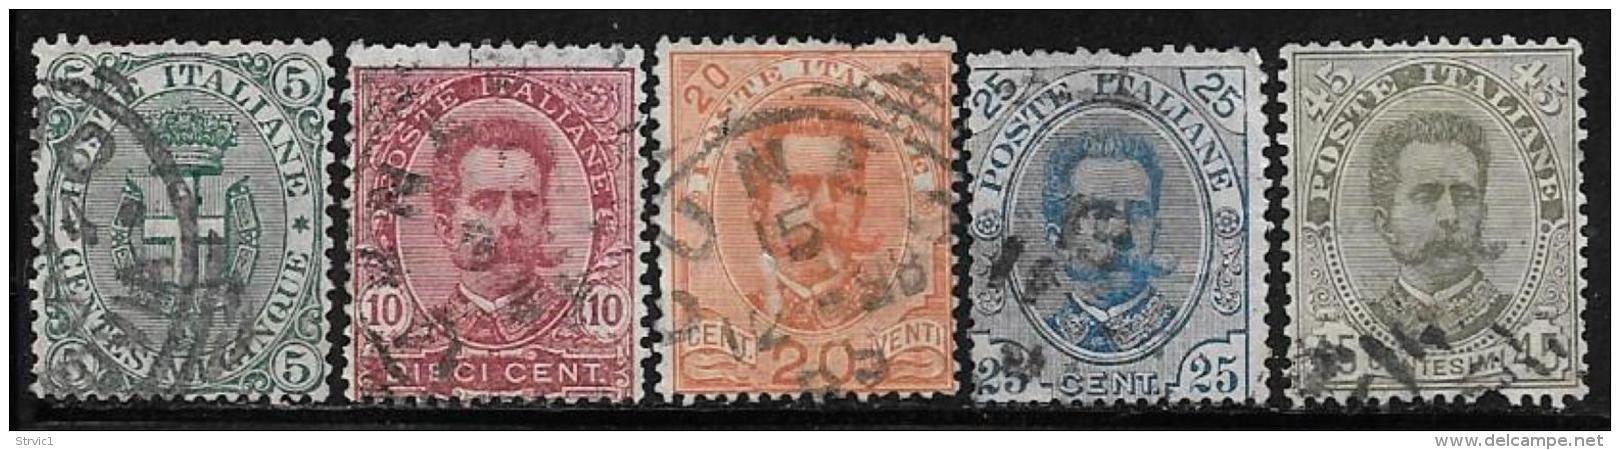 Italy, Scott # 67-71 Used Humbert L,  1891-6,  Average Condition, Few Short Perfs - Used